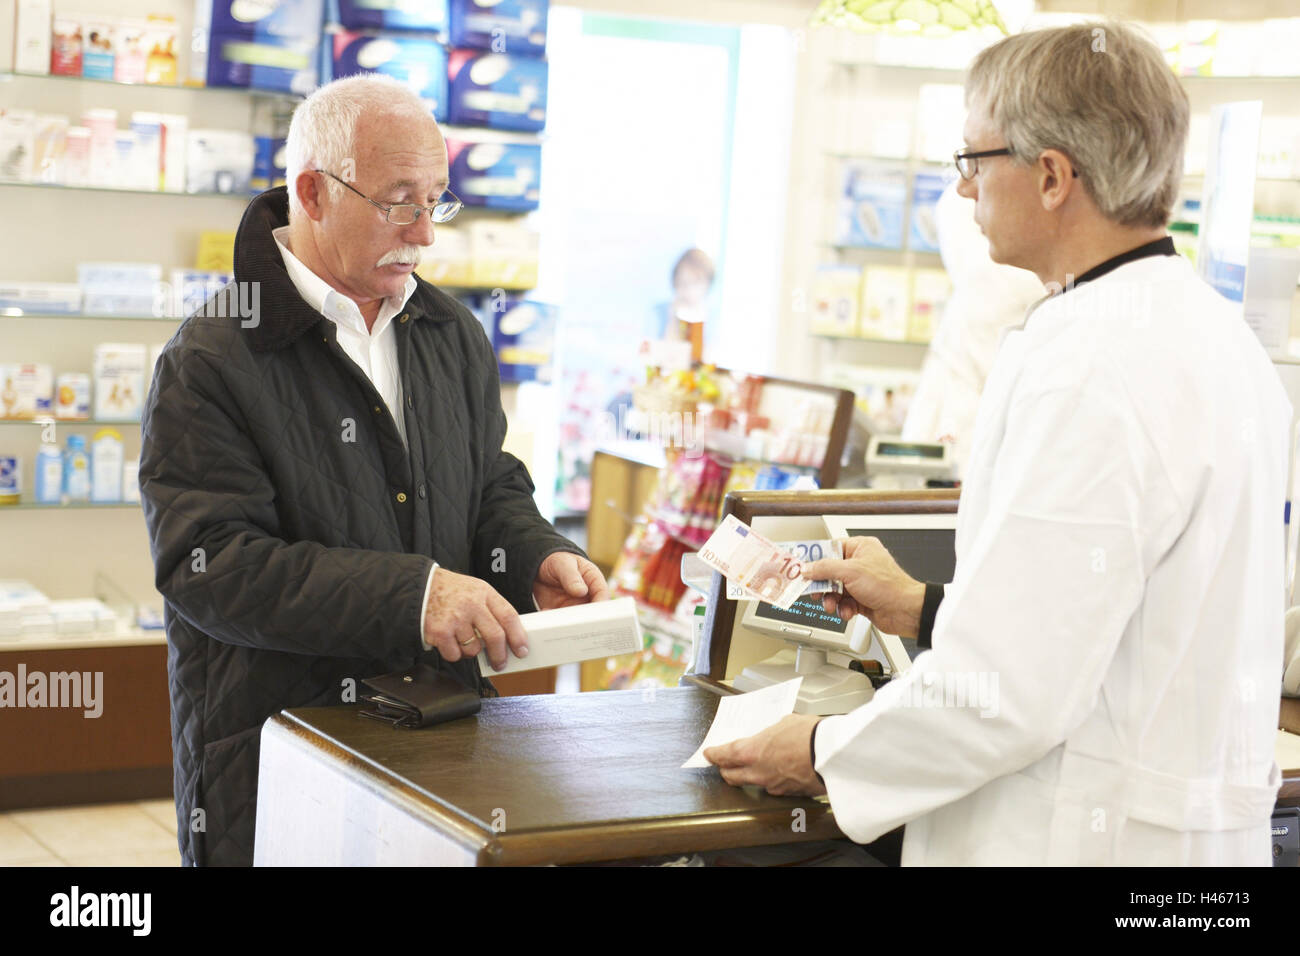 Hombre, farmacia, receta, drogas, pagar, Foto de stock